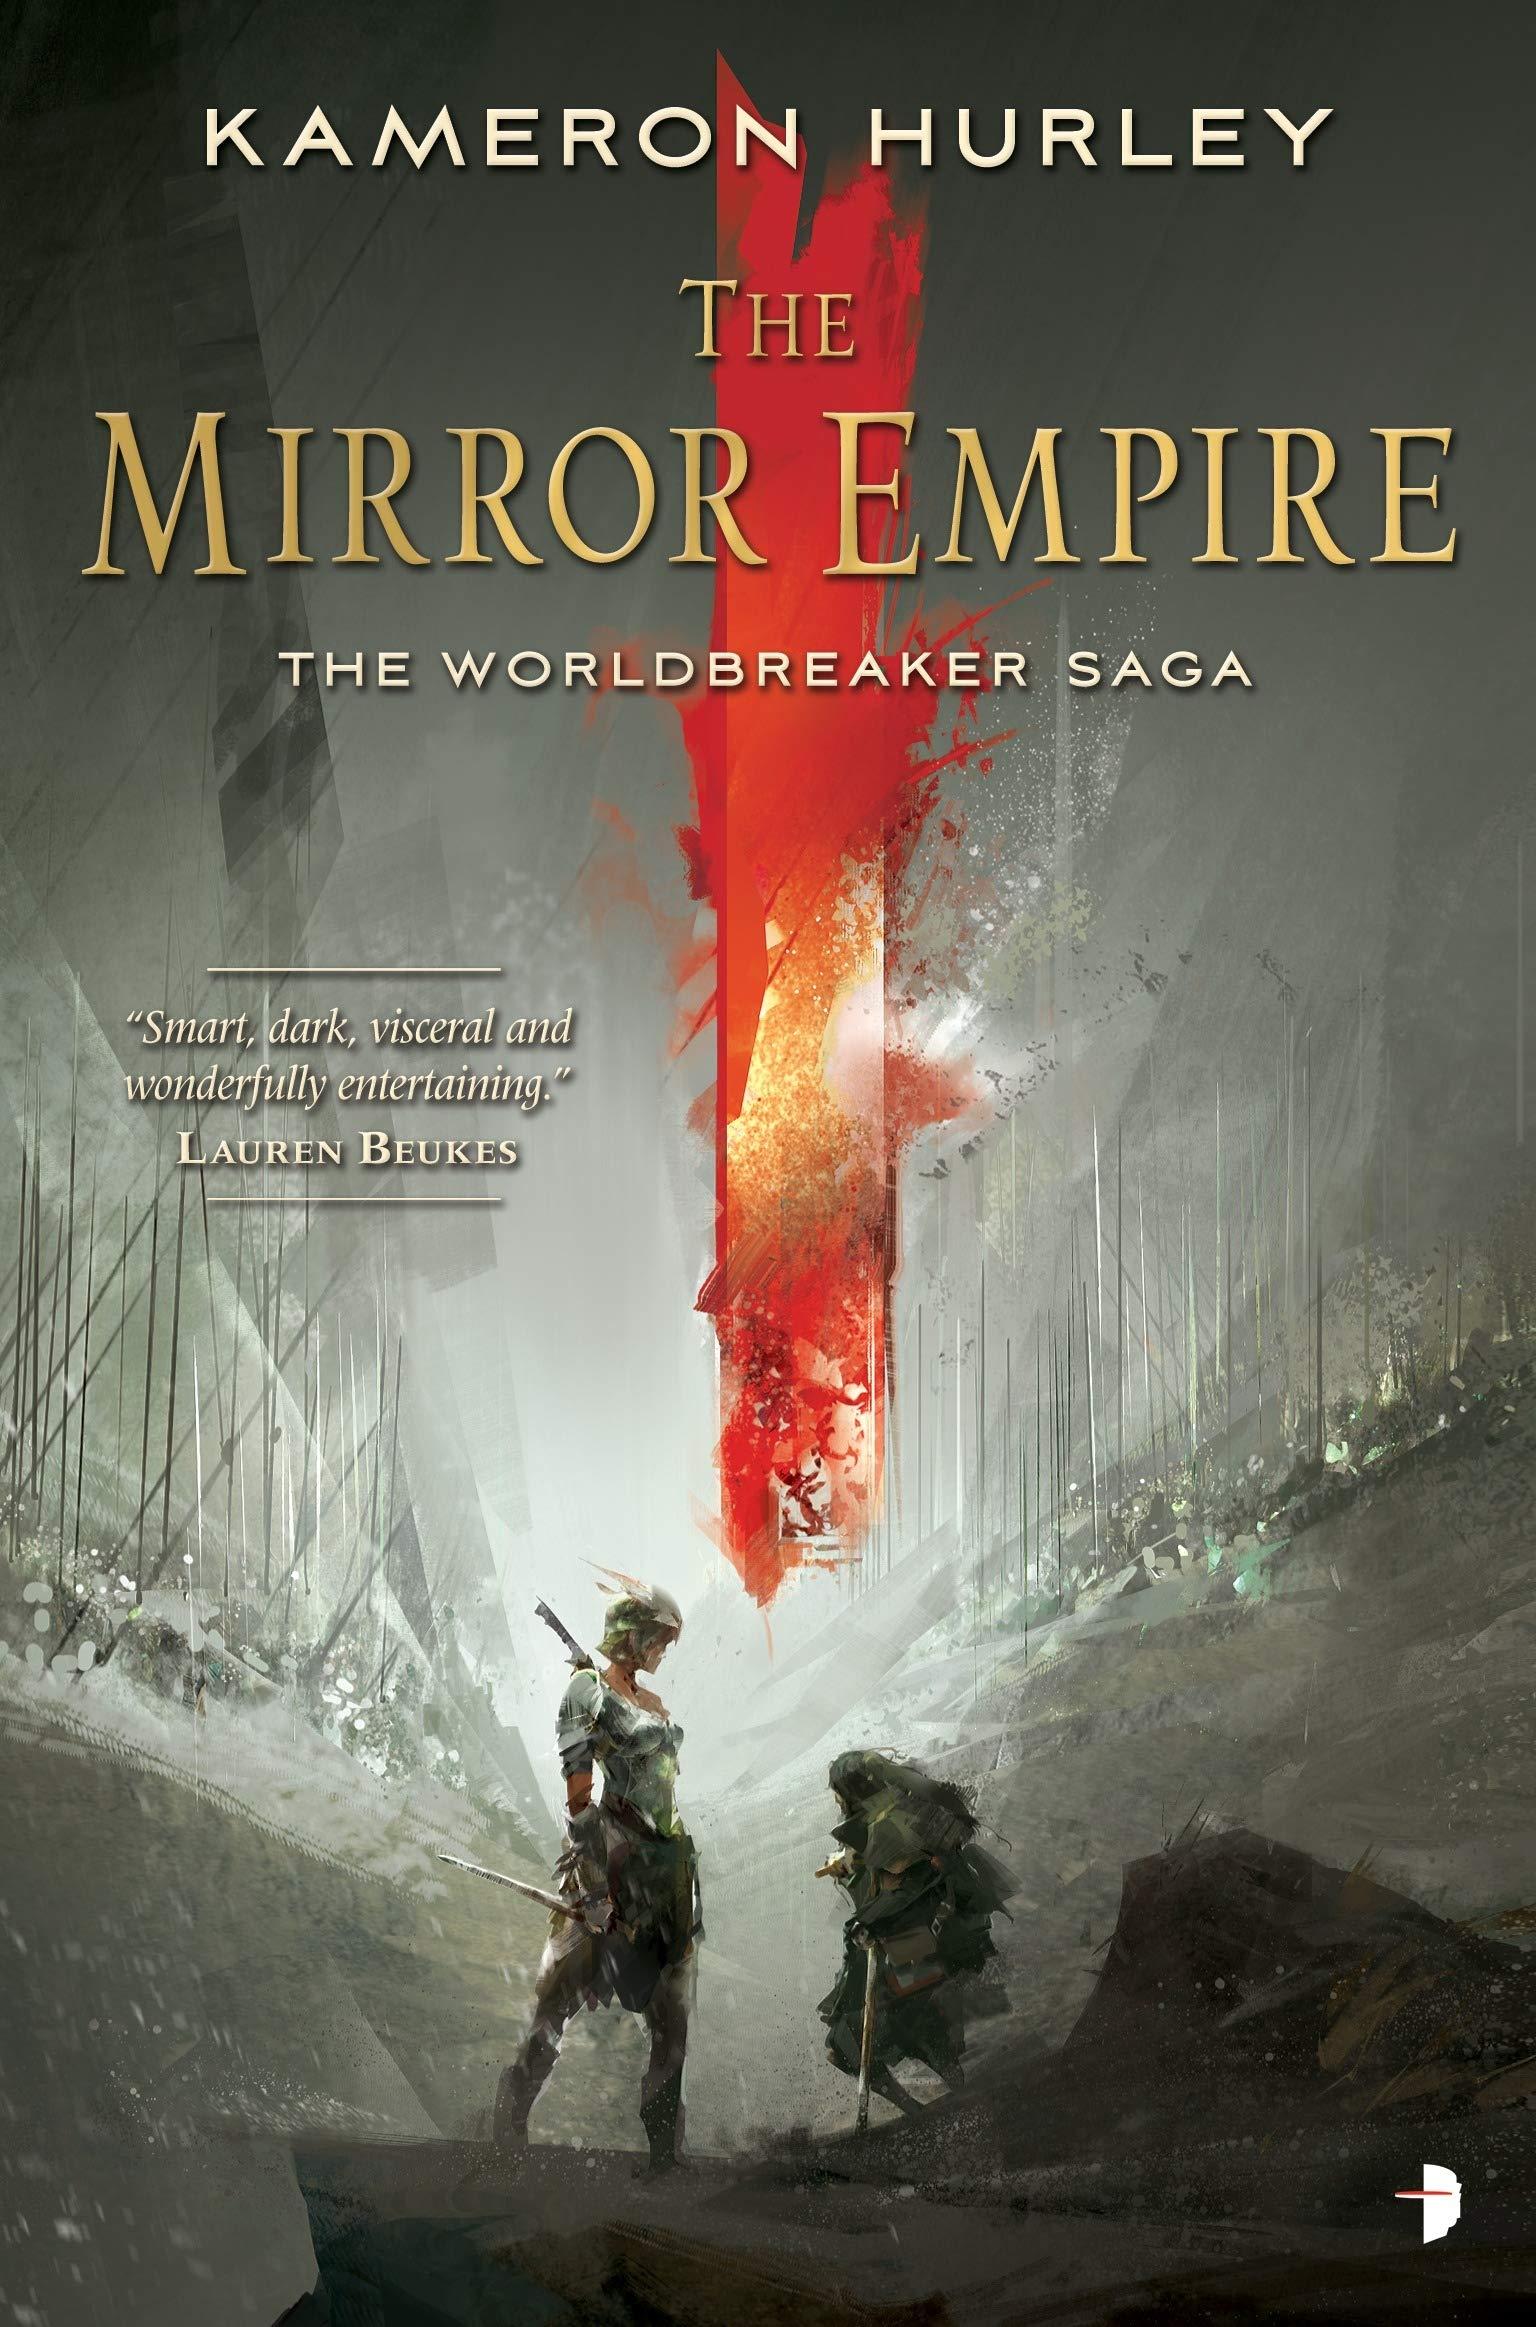 The Mirror Empire: Worldbreaker Saga 1 (The Worldbreaker